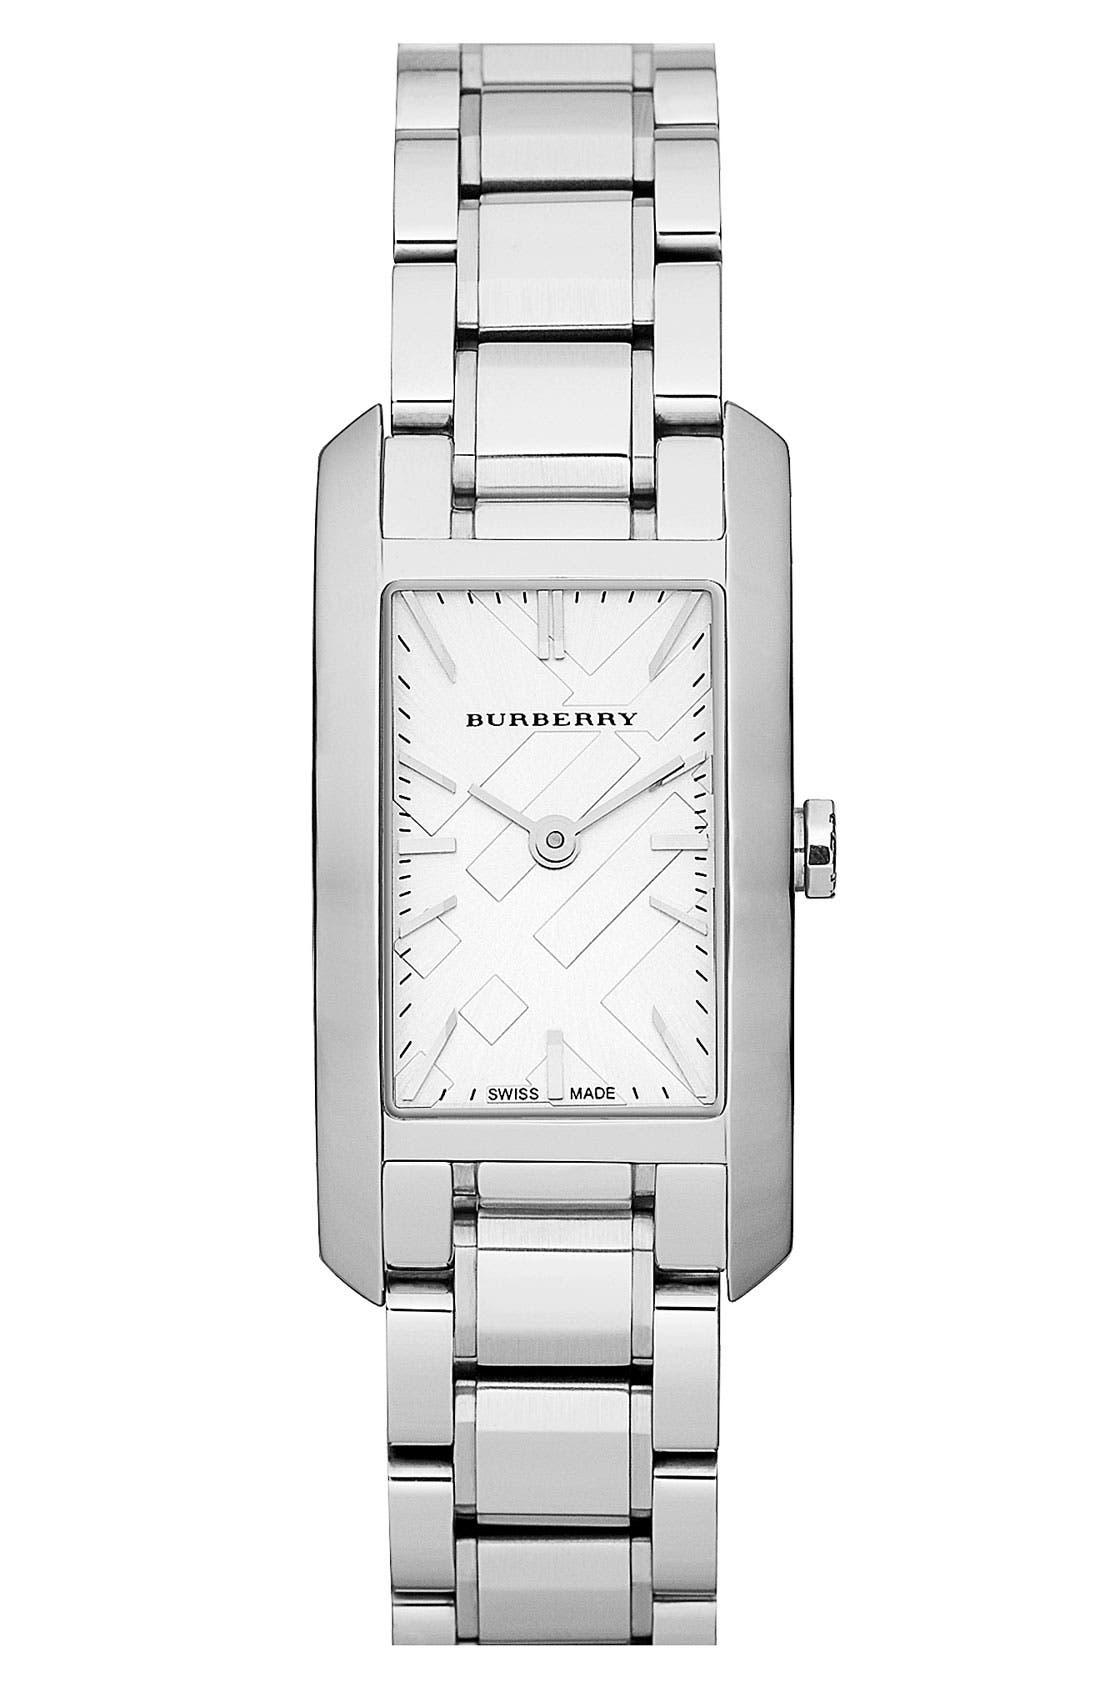 Main Image - Burberry Rectangular Bracelet Watch, 20mm x 26mm